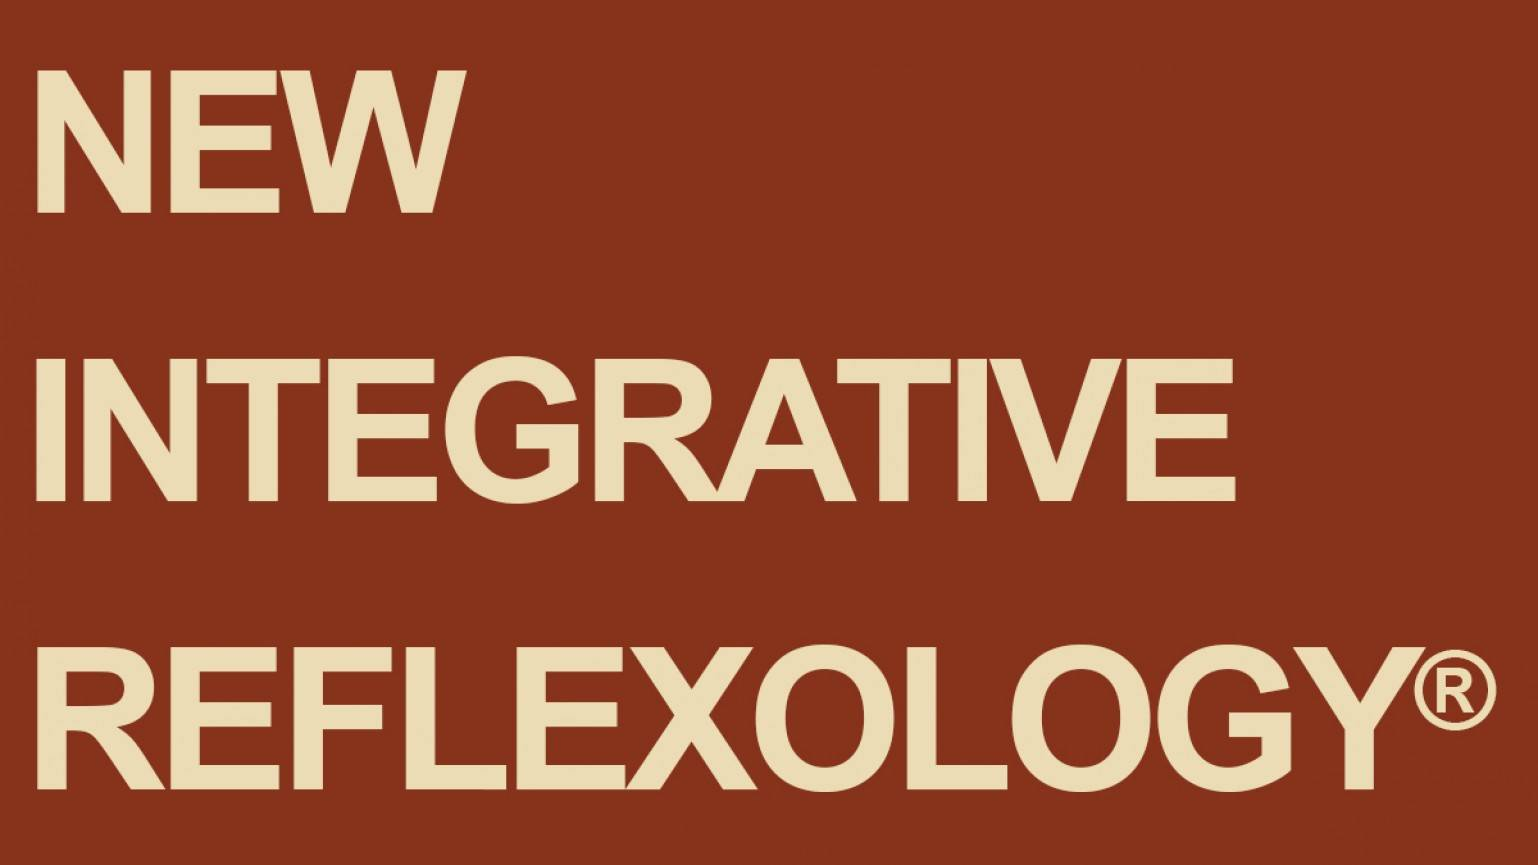 Integrative Reflexology